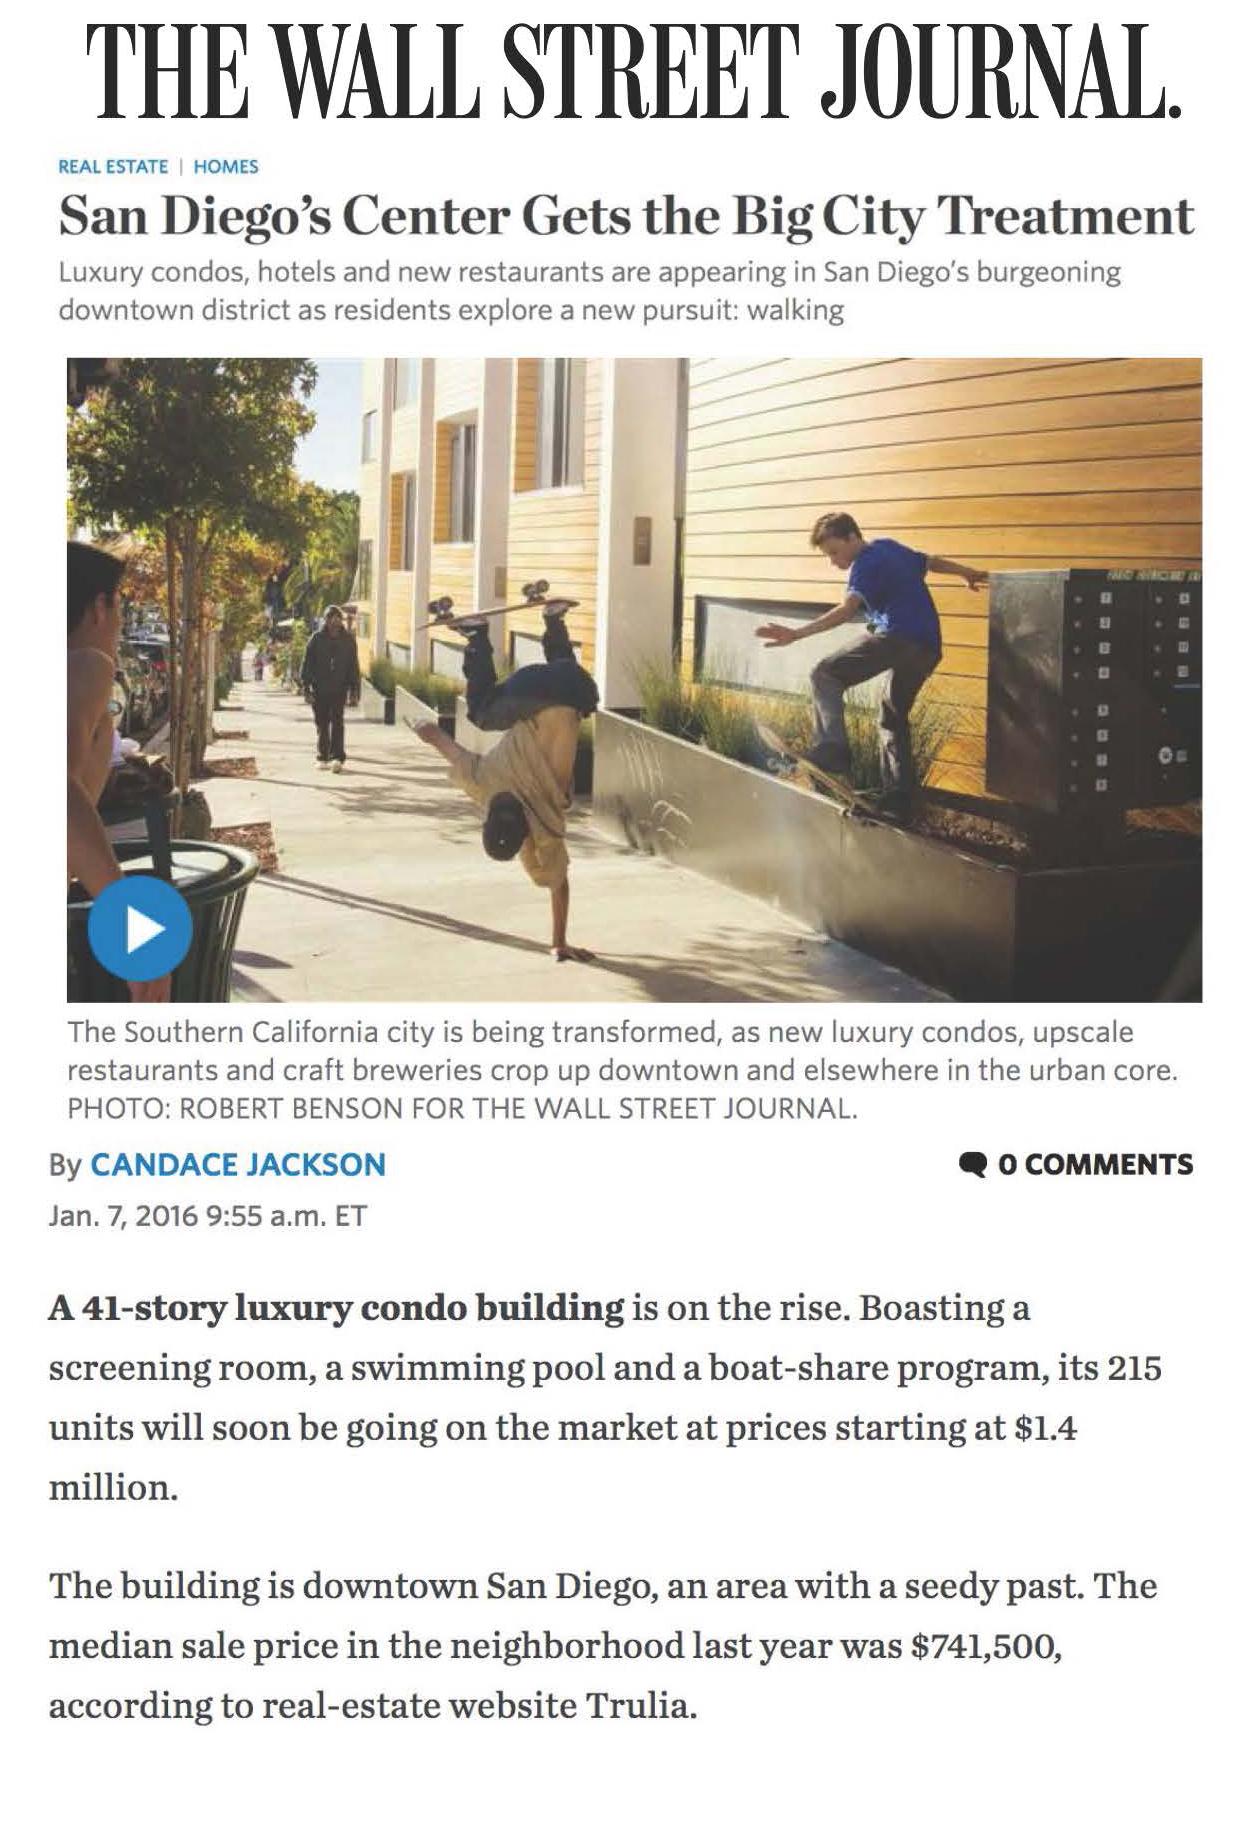 Jan_7_2016 Wall Street Journal_Page_01.jpg